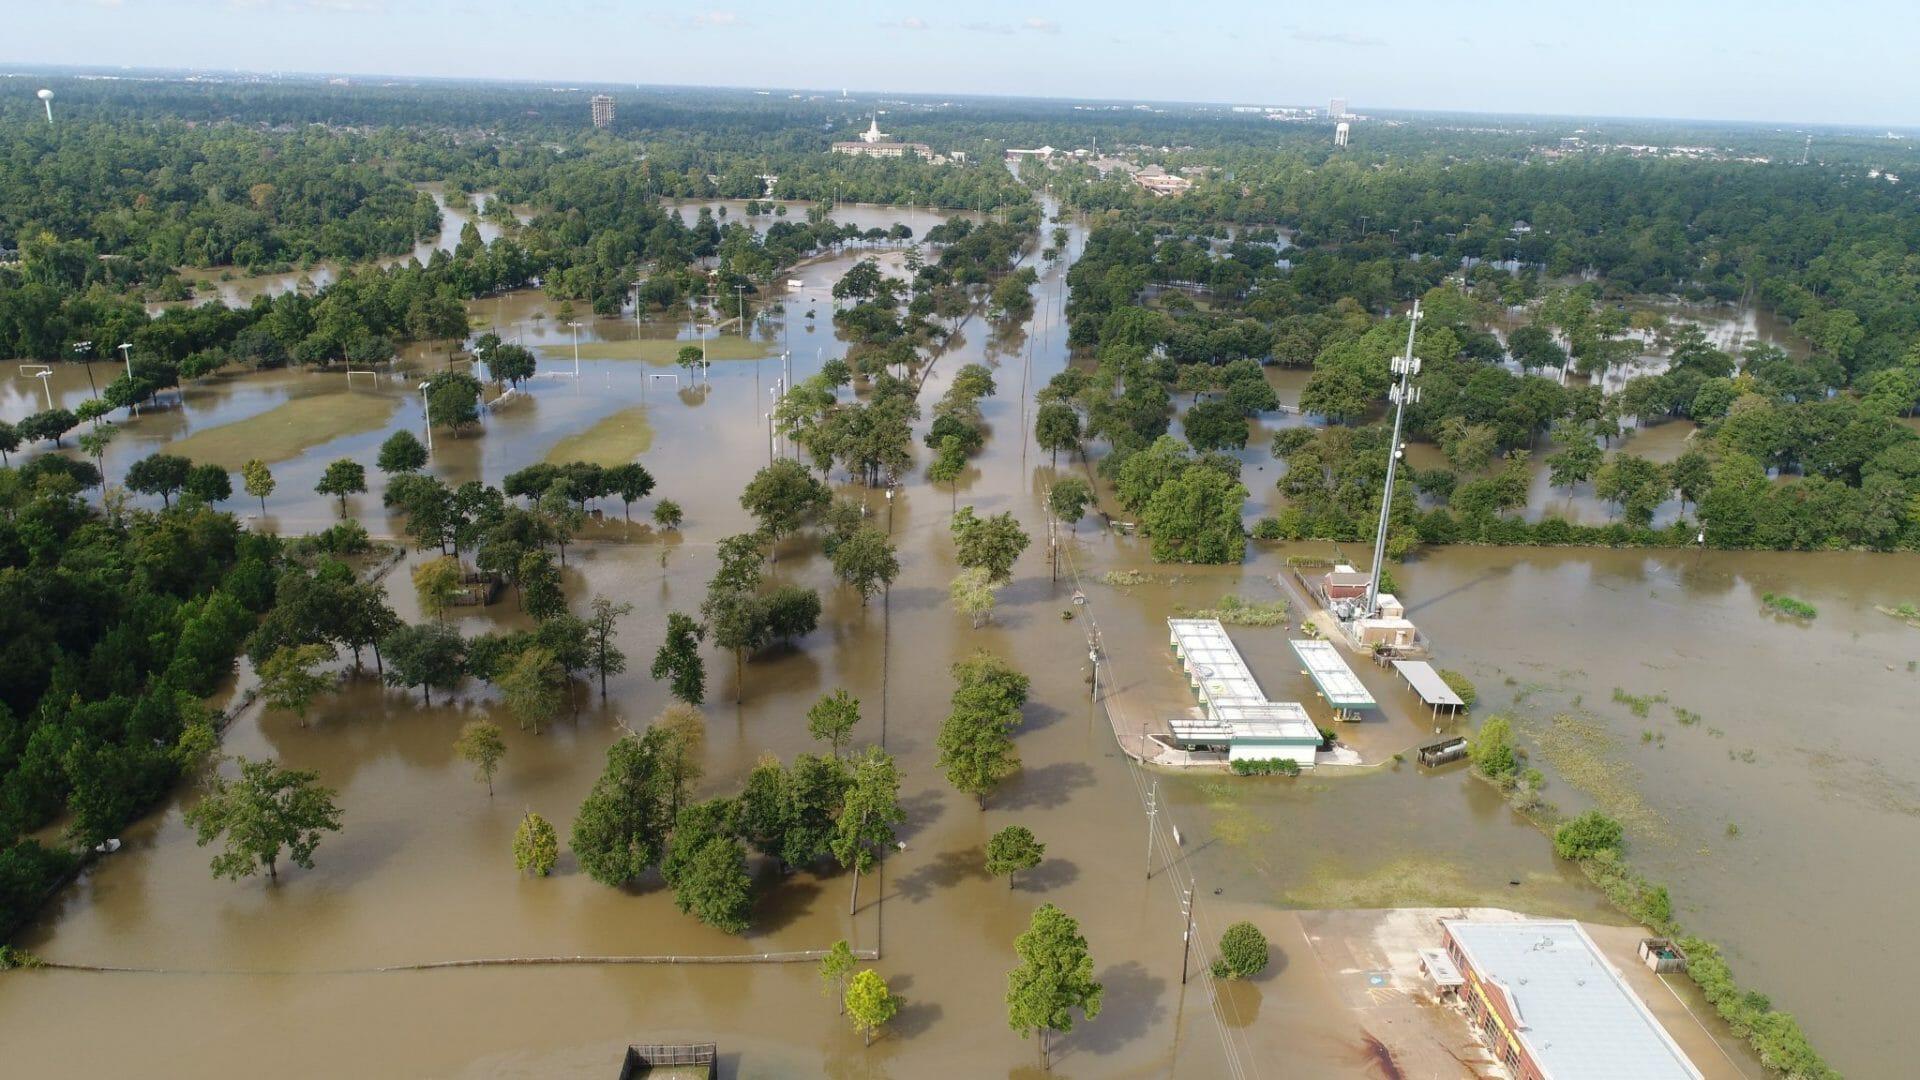 Houston Flooding Drone Coverage